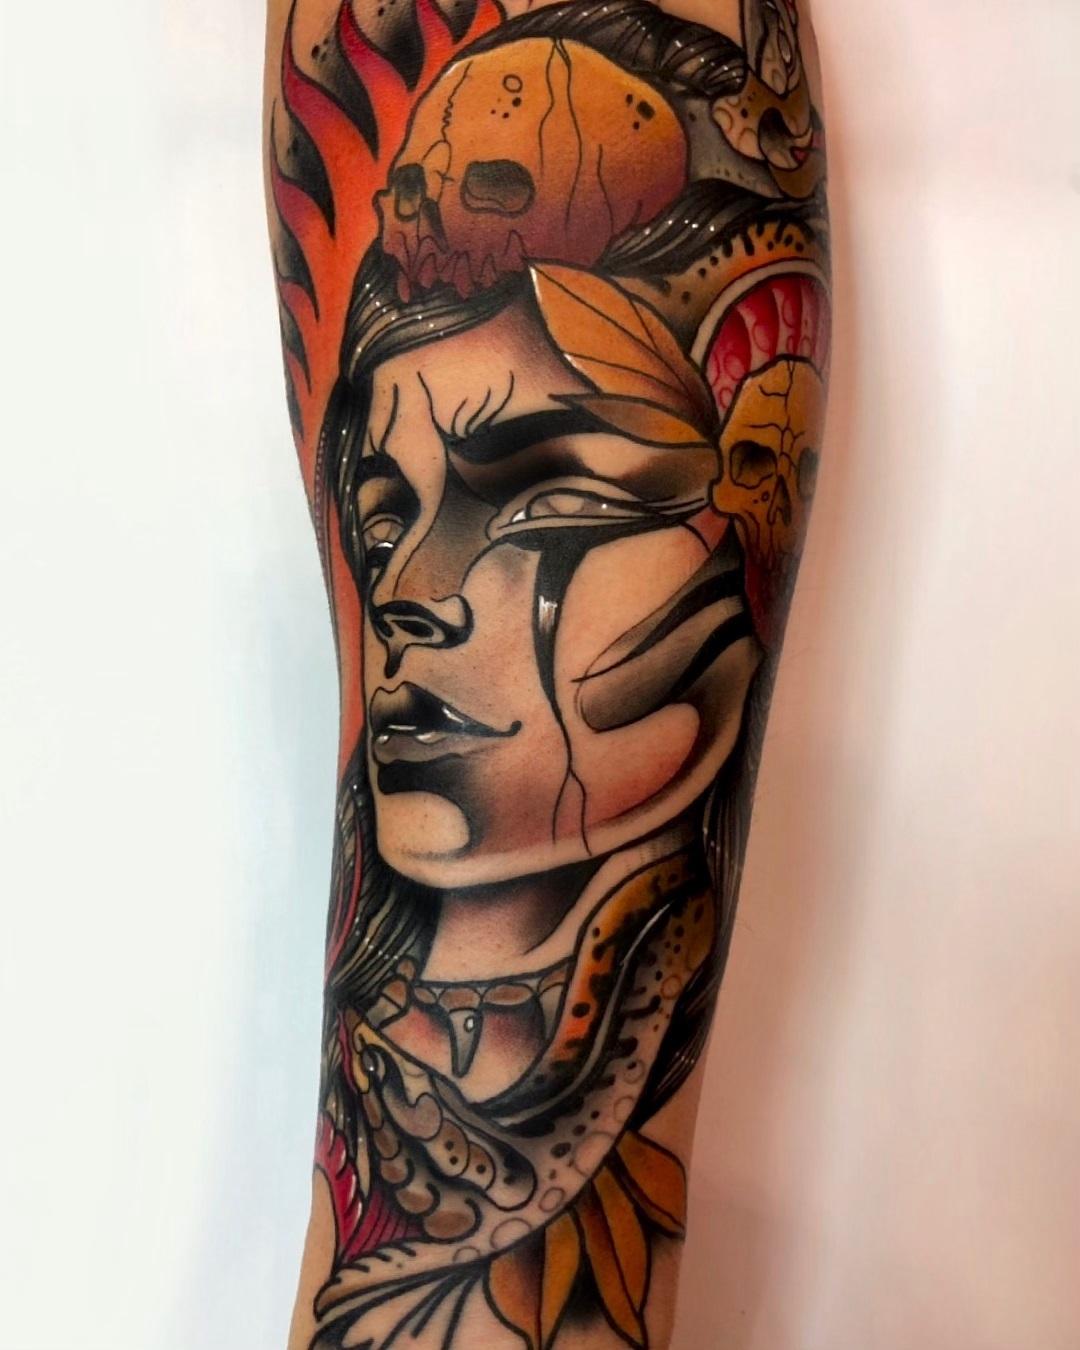 followforfollow,berlin,followmeciudadreal,ciudadreal,tomelloso,almagro,puertollano,tatuajesenpuertollano,tatuajesendaimiel,ciudadrealtattoo,ciudadrealtatuajes,tatuajesciudadreal,follow,ciudadrealtatuajes,puertollano,ciudadreal,tattoos,ciudadrealtattoo,tattooers,besttattooers,juantabasco,ciudadrealsetatua,ink,tatuajes,realismo,realistictattoo,ciudadrealtattoo,tatuajesenpuertollano,traditionaltattoos,castillalamancha,ink,tattooart,zurichtattoo,daimiel,blackandgreytattoo,daimiel,CheyenneTattooEquipment